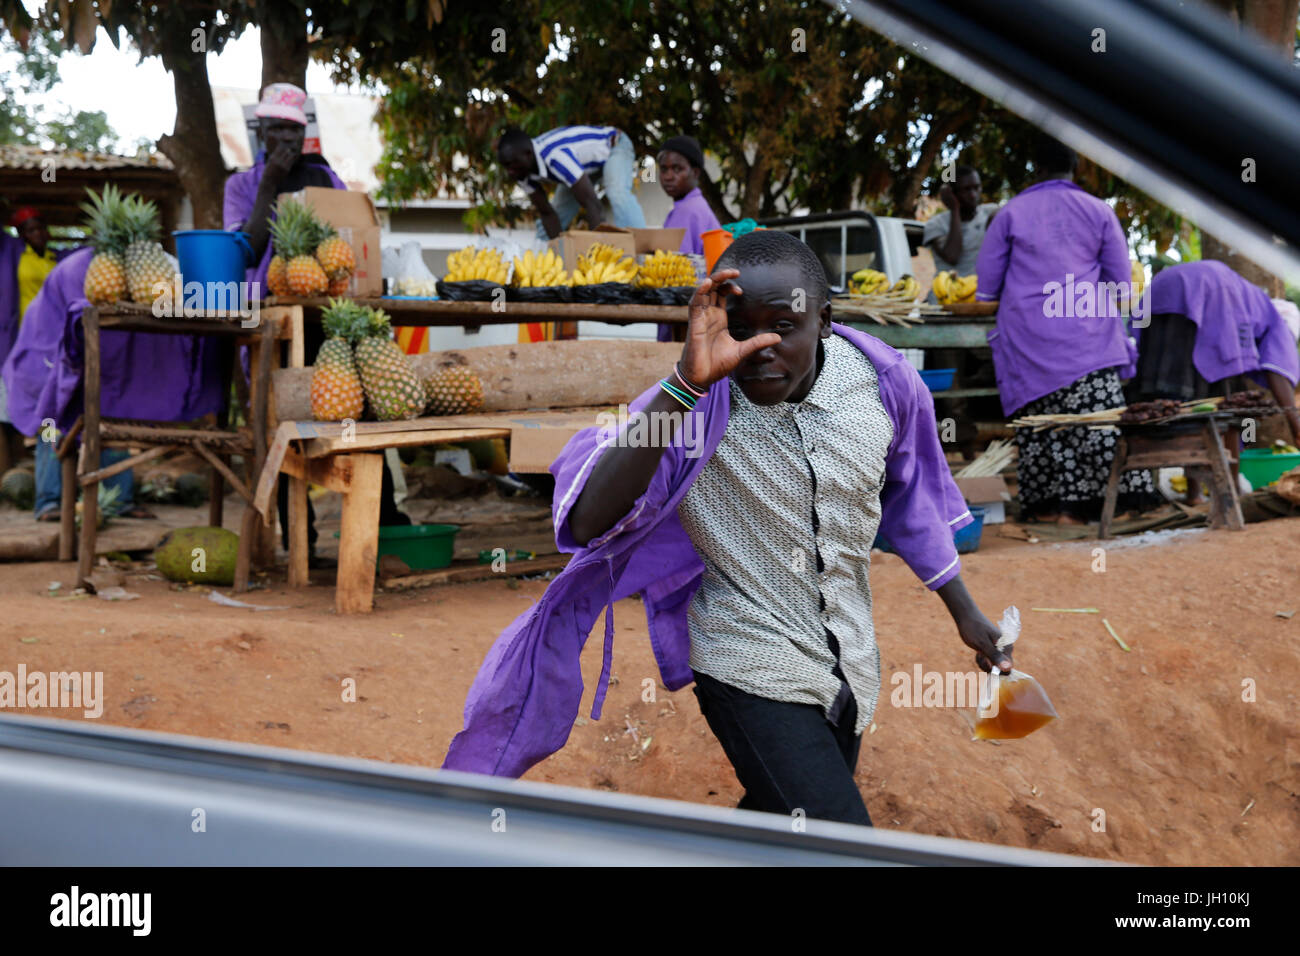 Fruit vendors. Uganda. - Stock Image